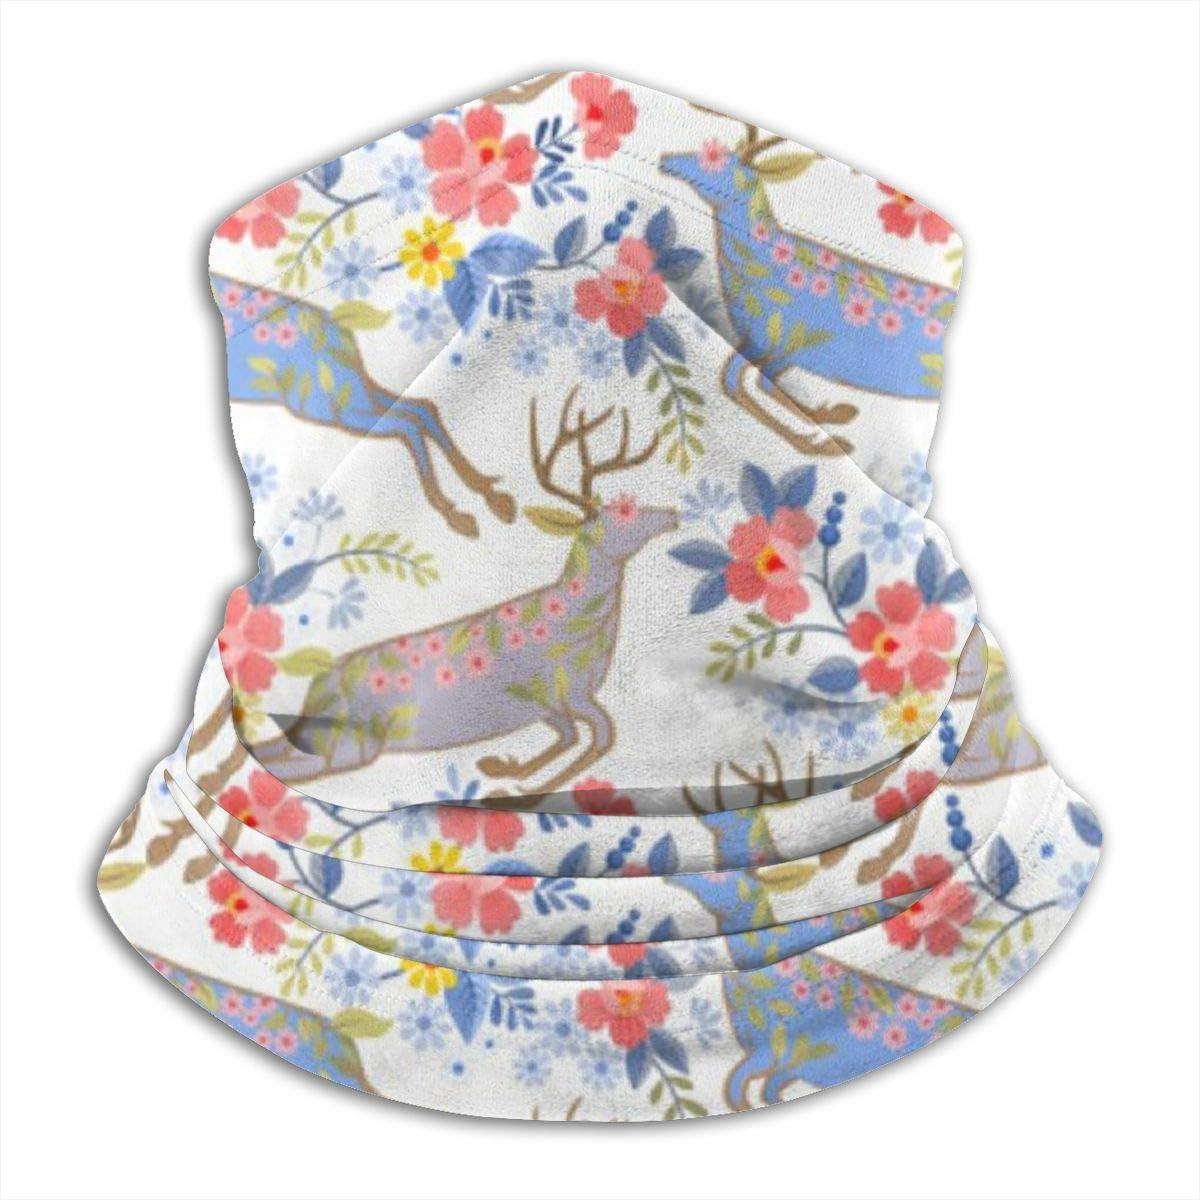 Microfiber Neck Warmer Floral Deer Flower Vintage Neck Gaiter Tube Ear Warmer Headband Scarf Face Mask Balaclava Black